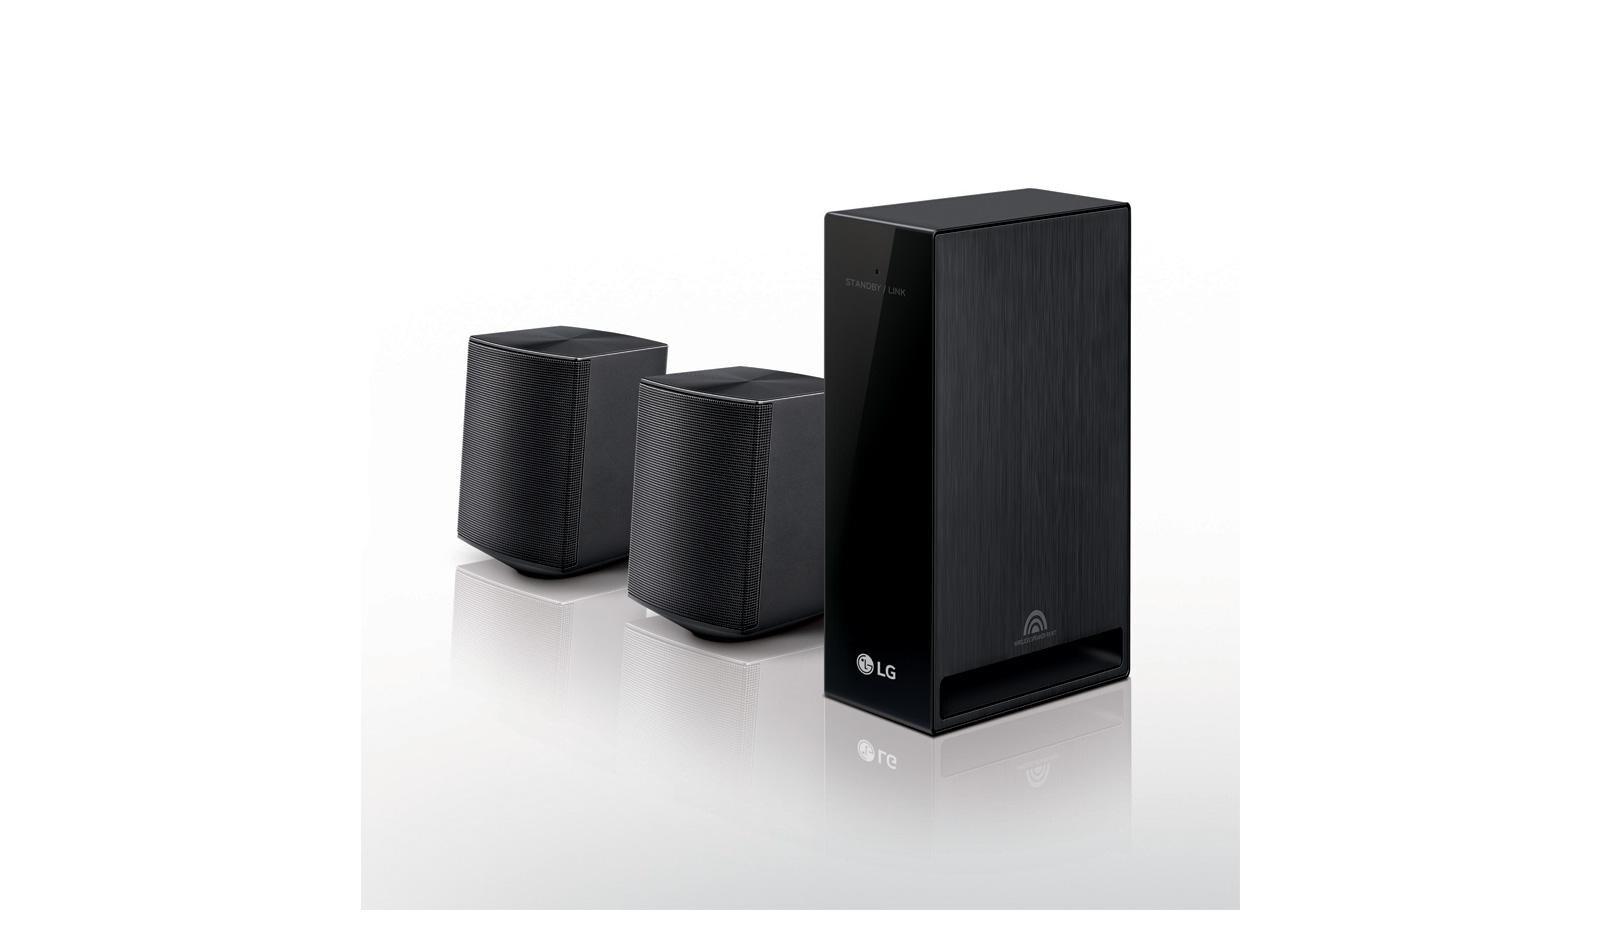 Lg Spj4 S 20 Ch Sound Bar Wireless Rear Speaker Kit Usa Valor Radio Wiring Harness Diagram